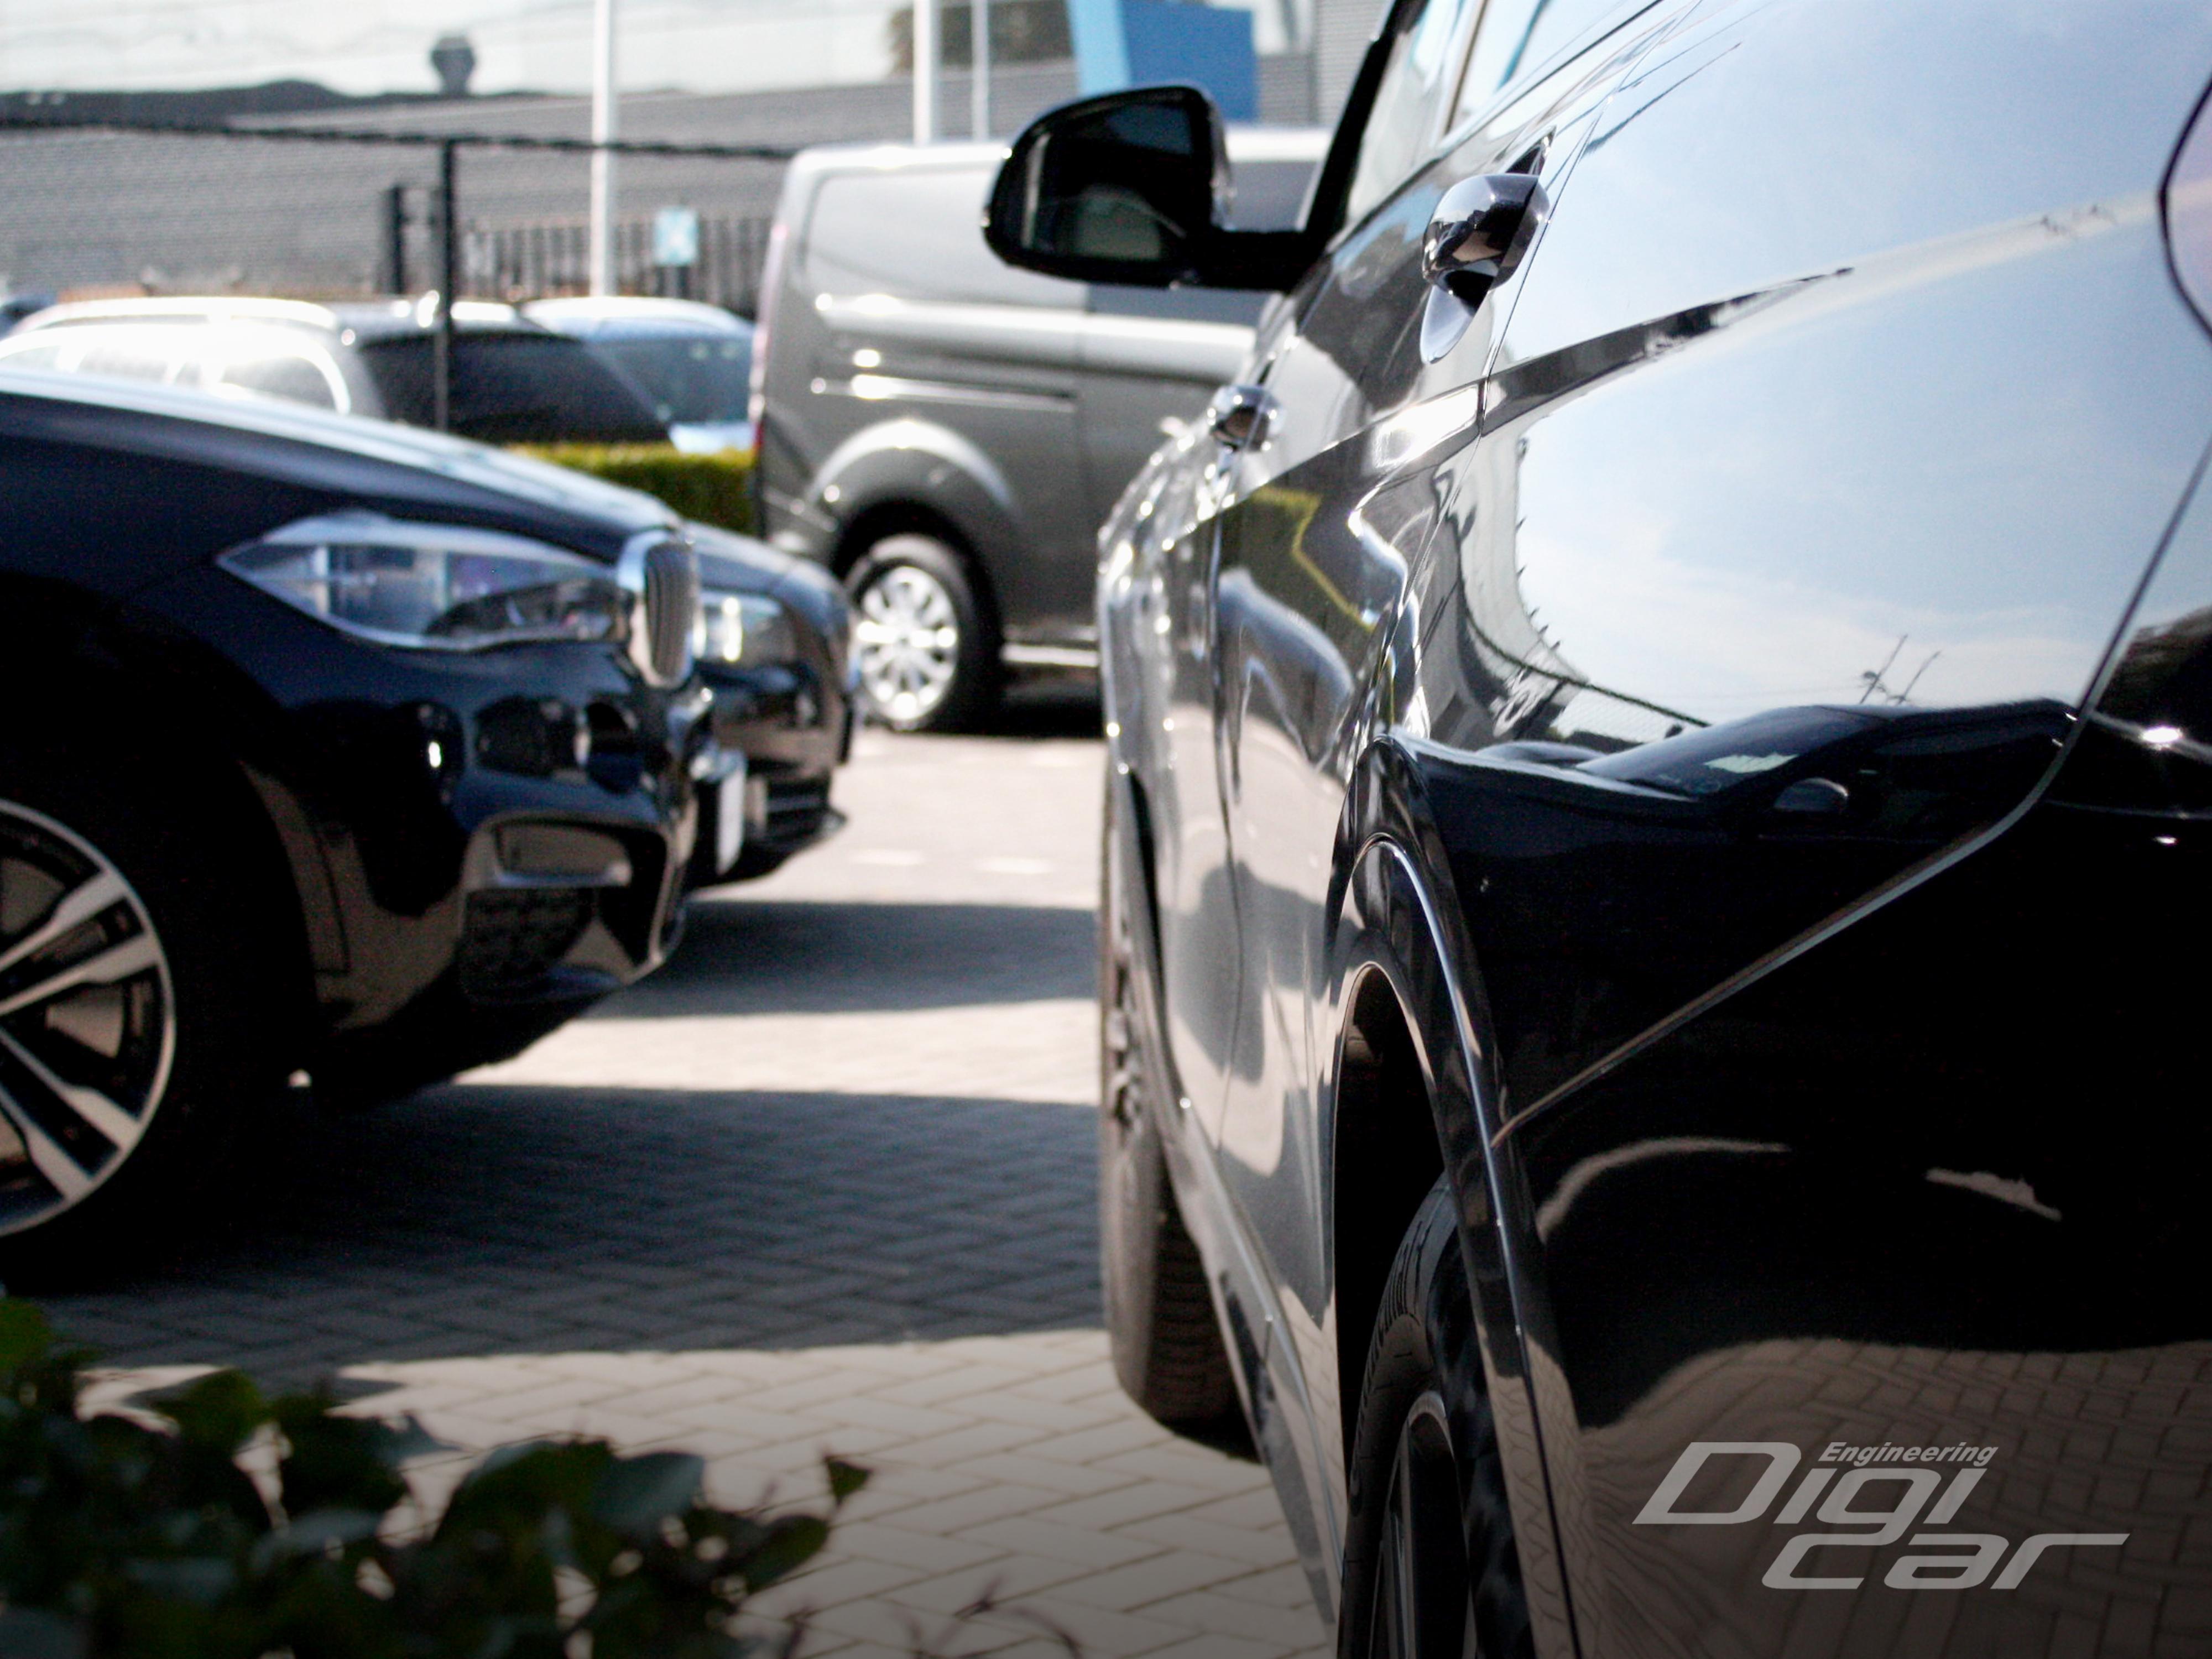 Digicar-Buiten-BMWs-Transit.jpg